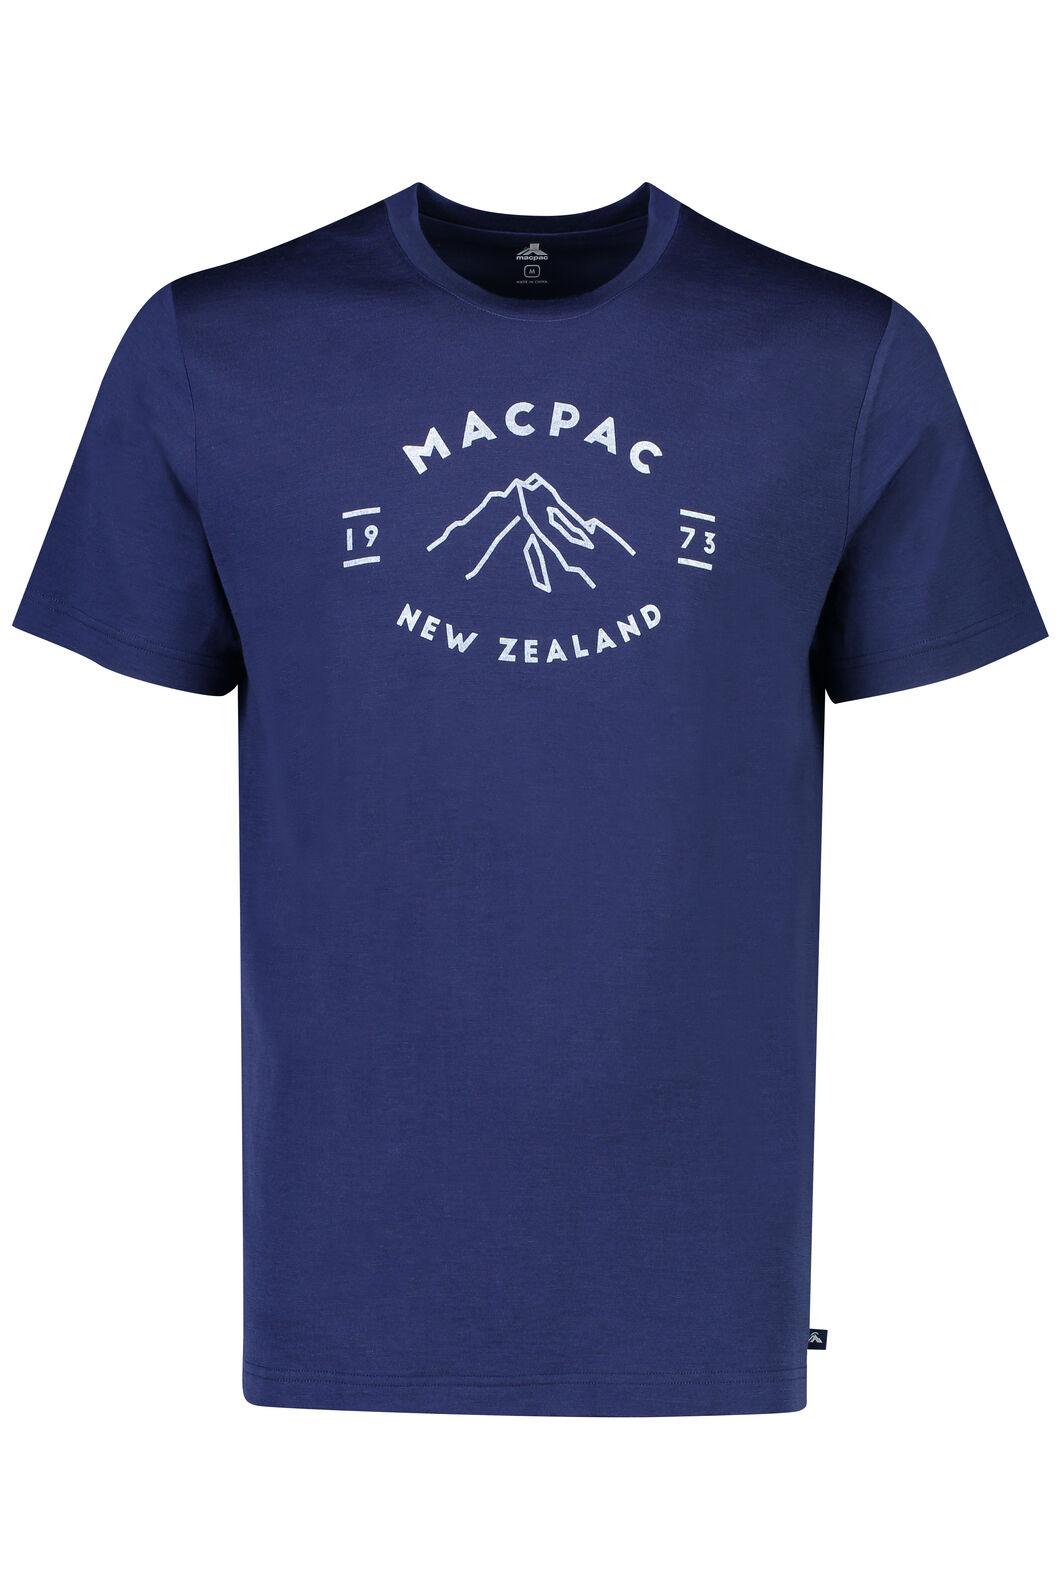 Mountain  Merino 180 Tee - Men's, Medieval Blue, hi-res